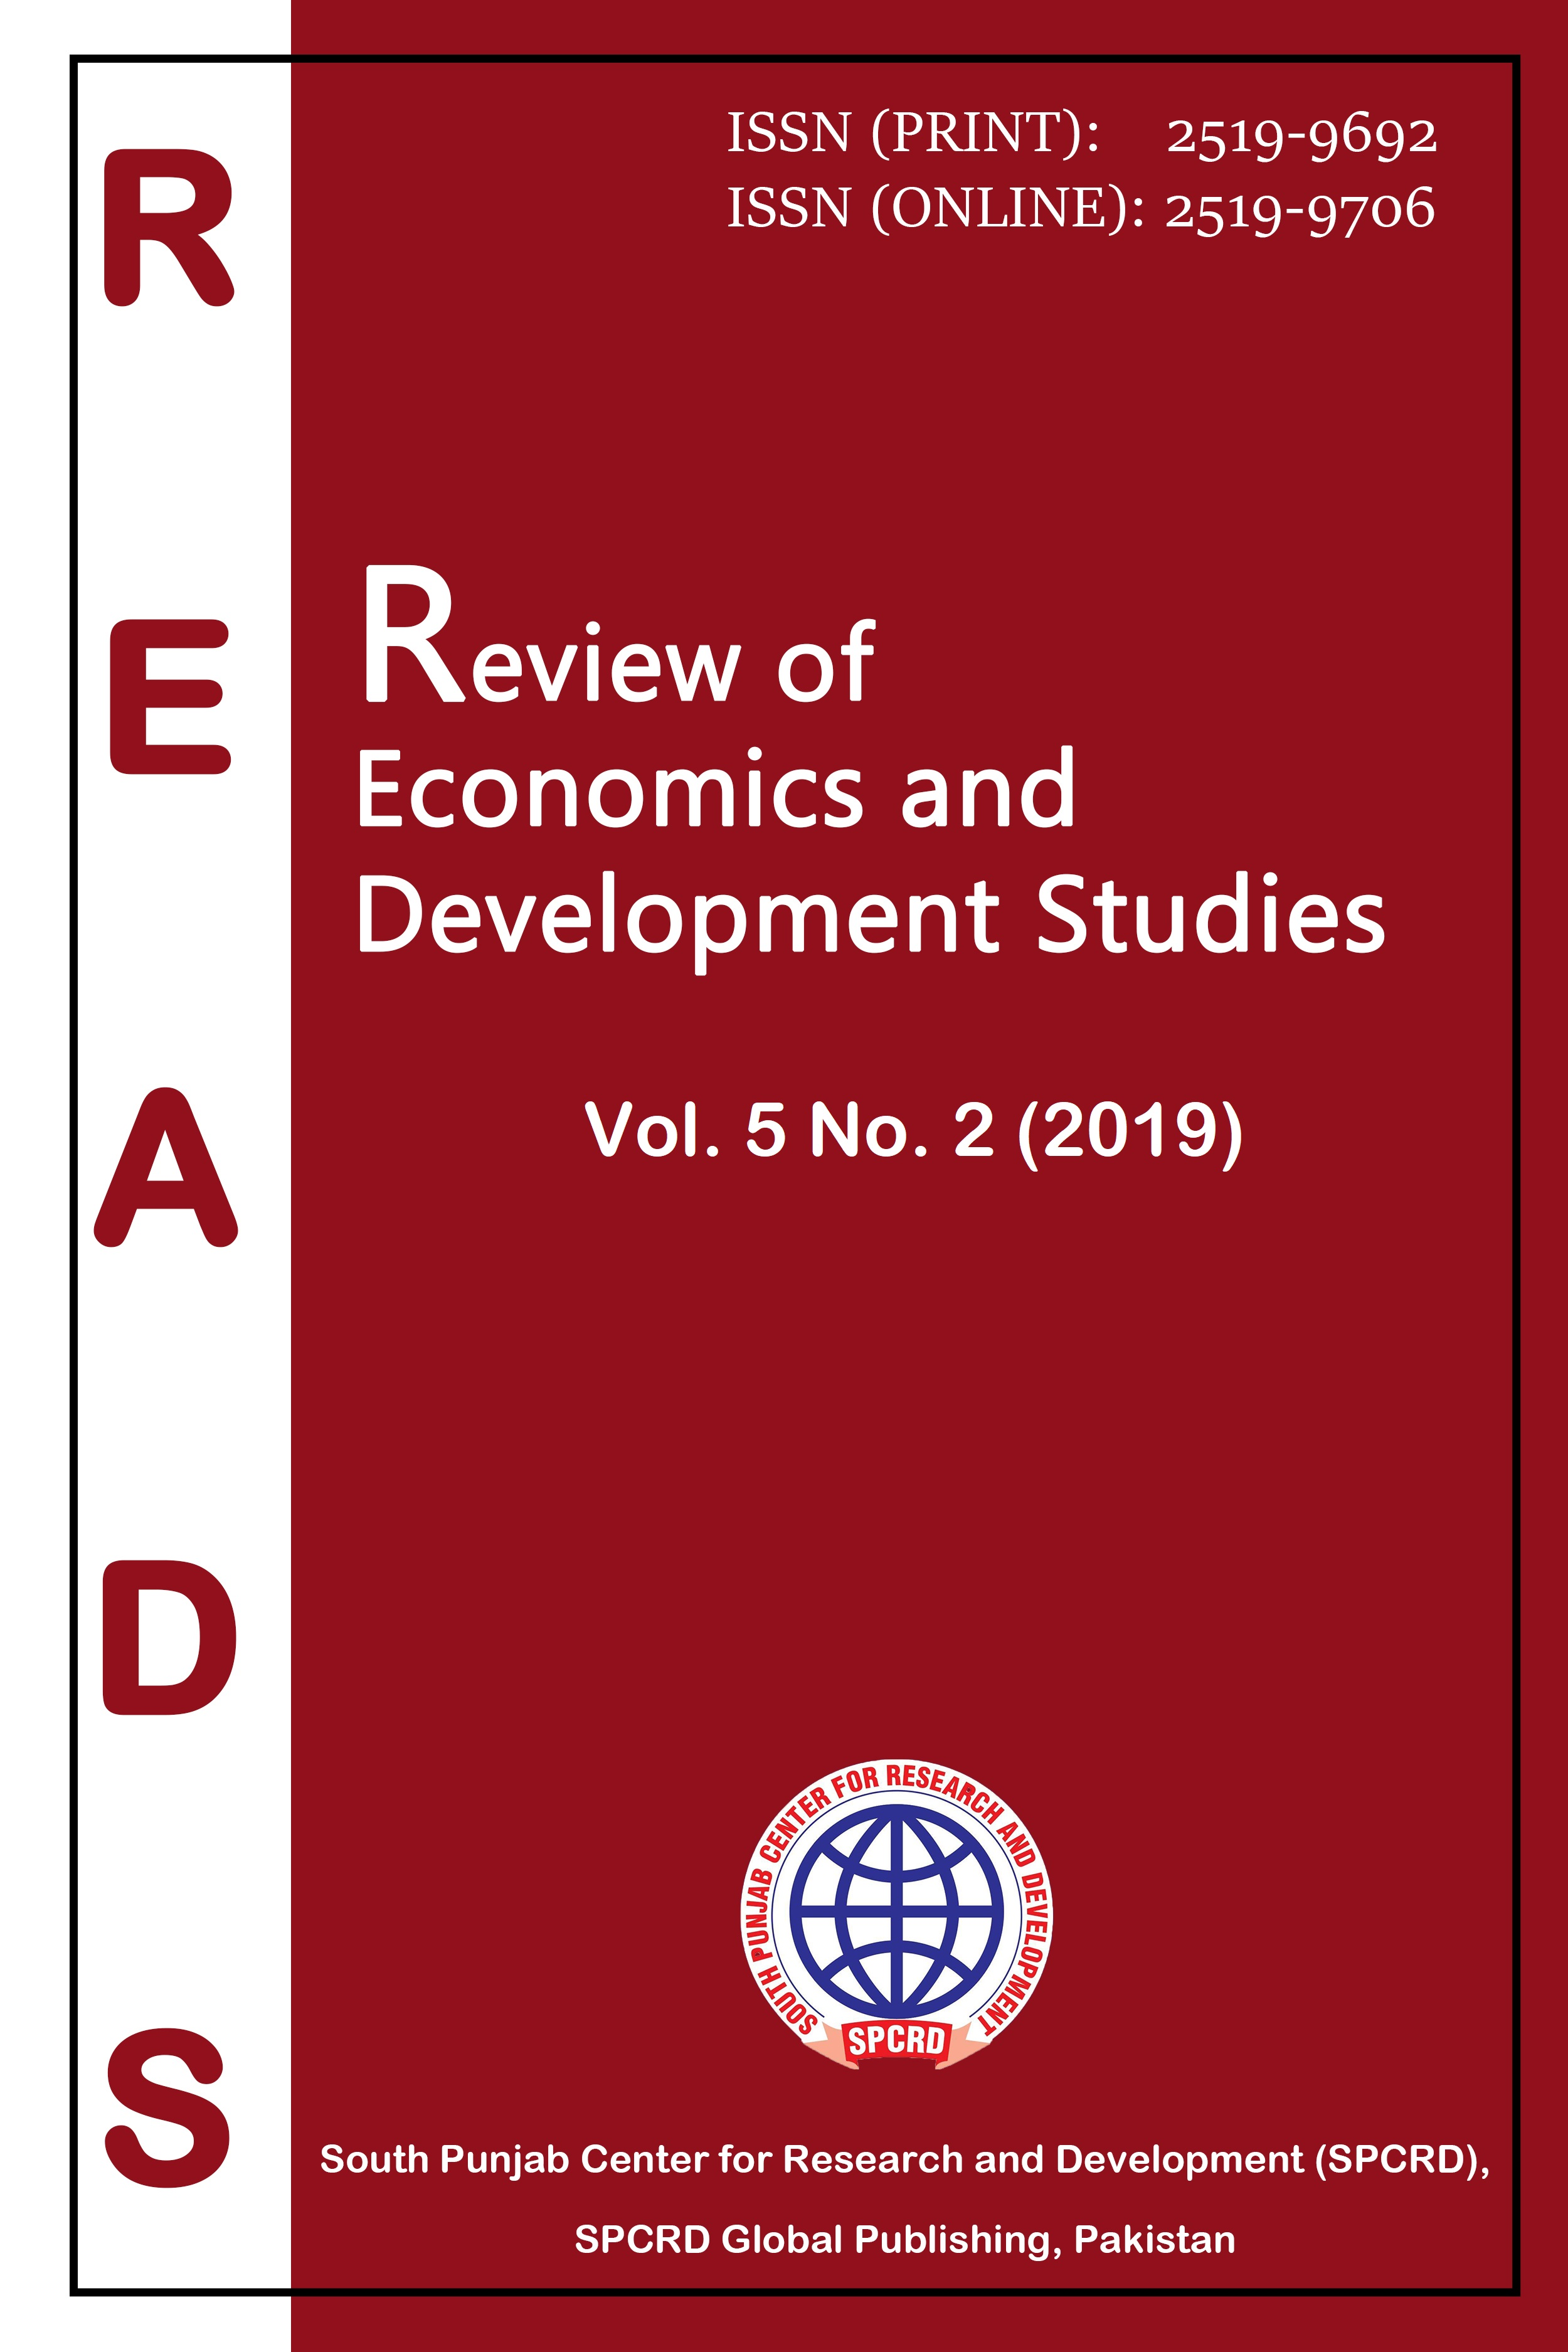 View Vol. 5 No. 2 (2019): Review of Economics and Development Studies (READS)